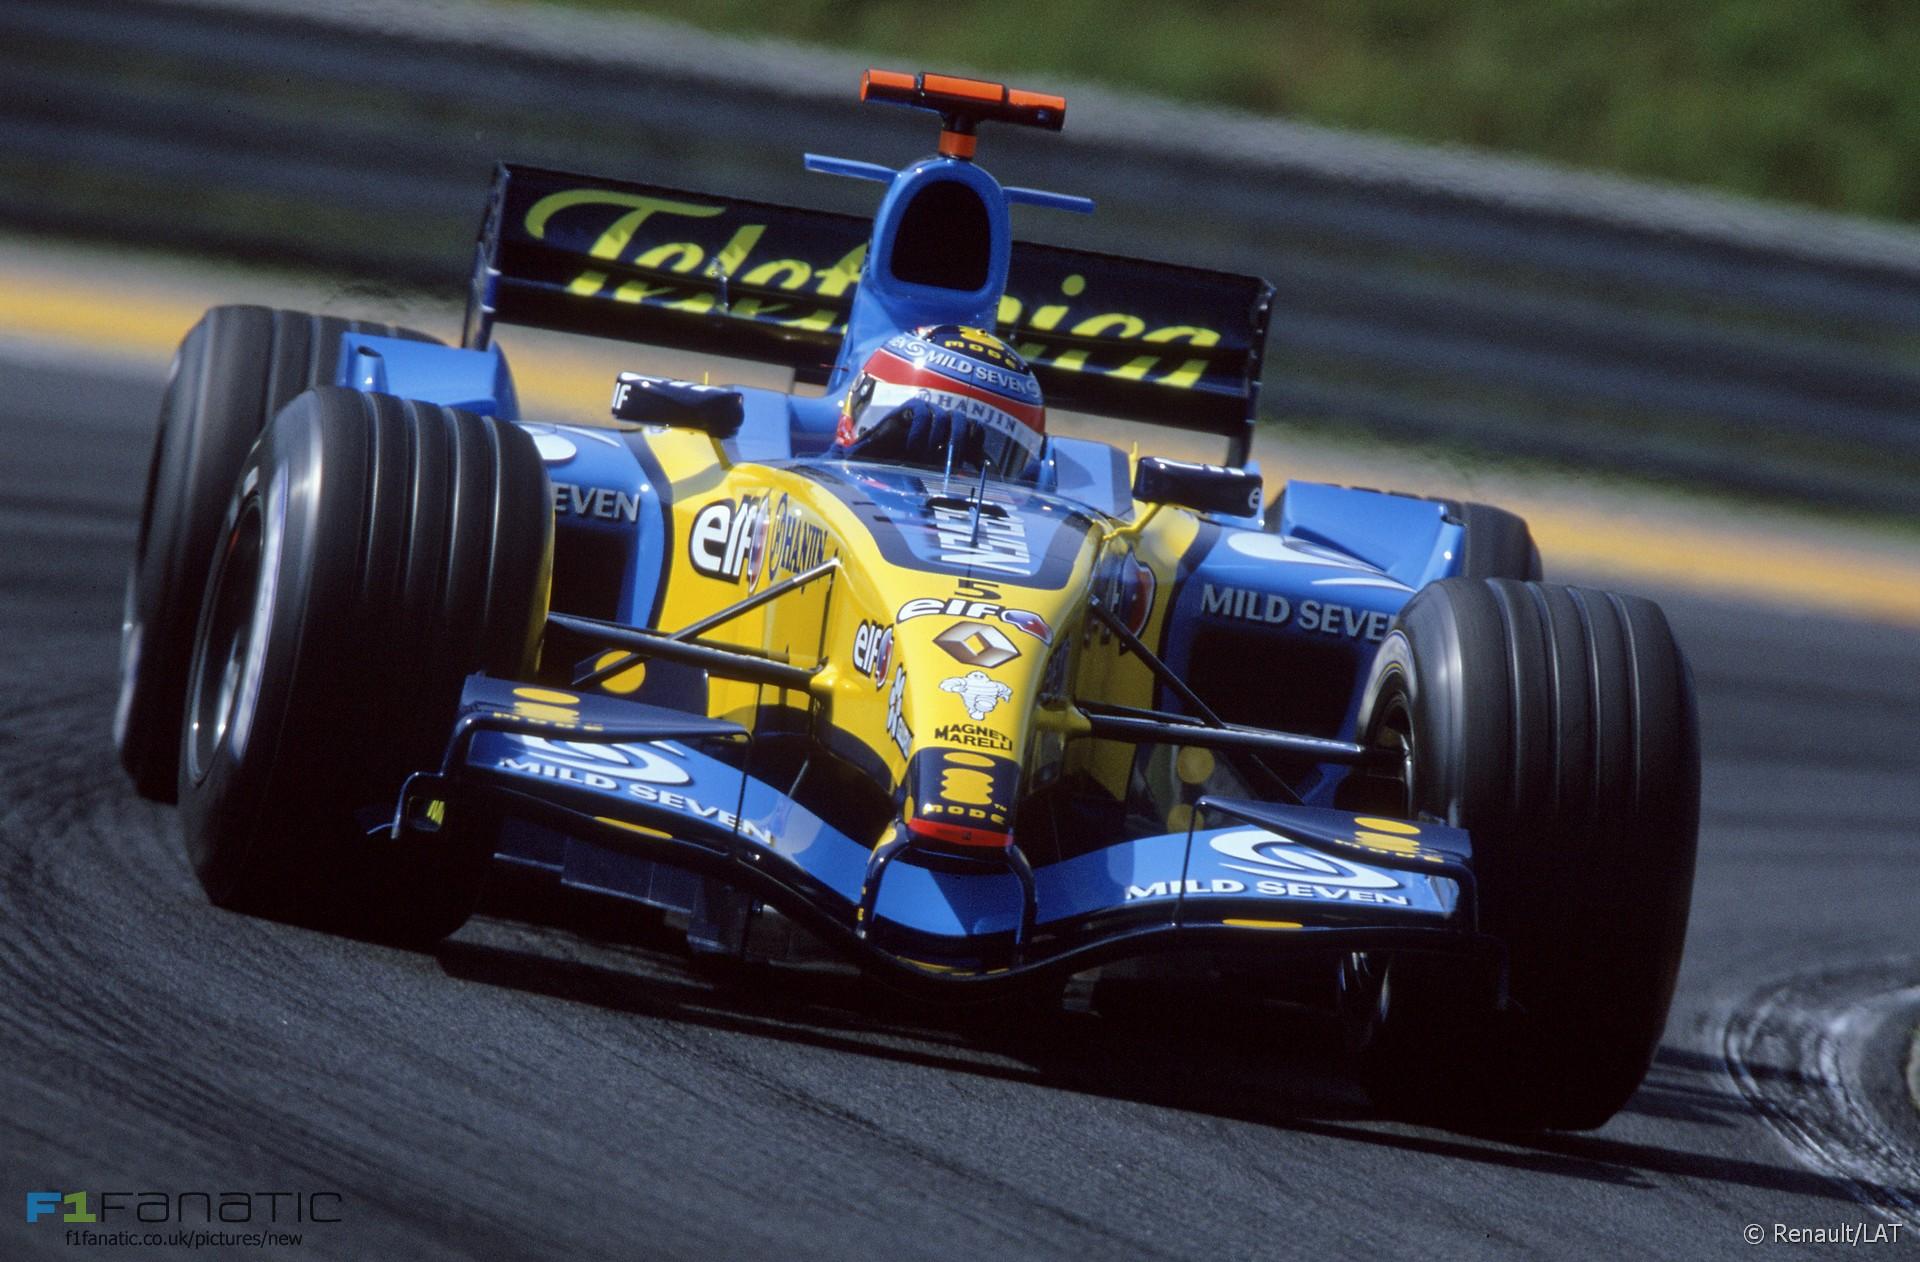 Fernando Alonso, Renault, Hungaroring, 2005